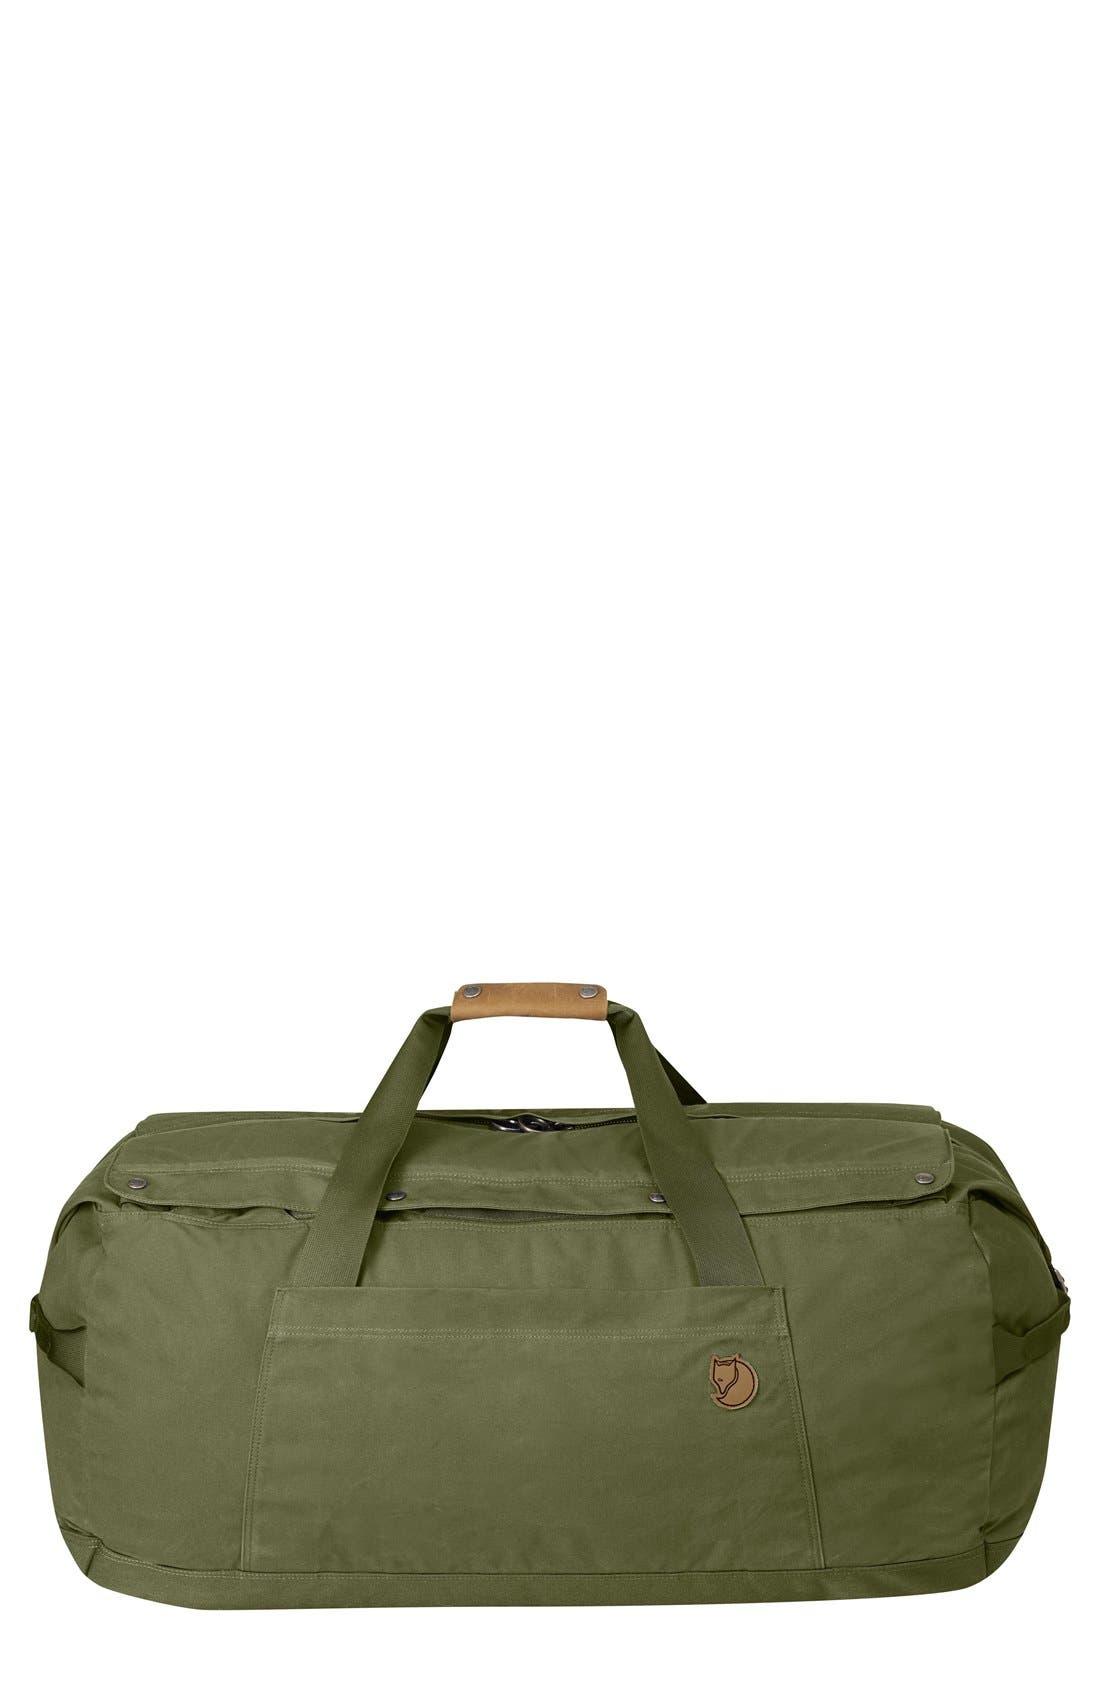 'Duffel Bag No. 6' Large Duffel Bag,                             Main thumbnail 2, color,